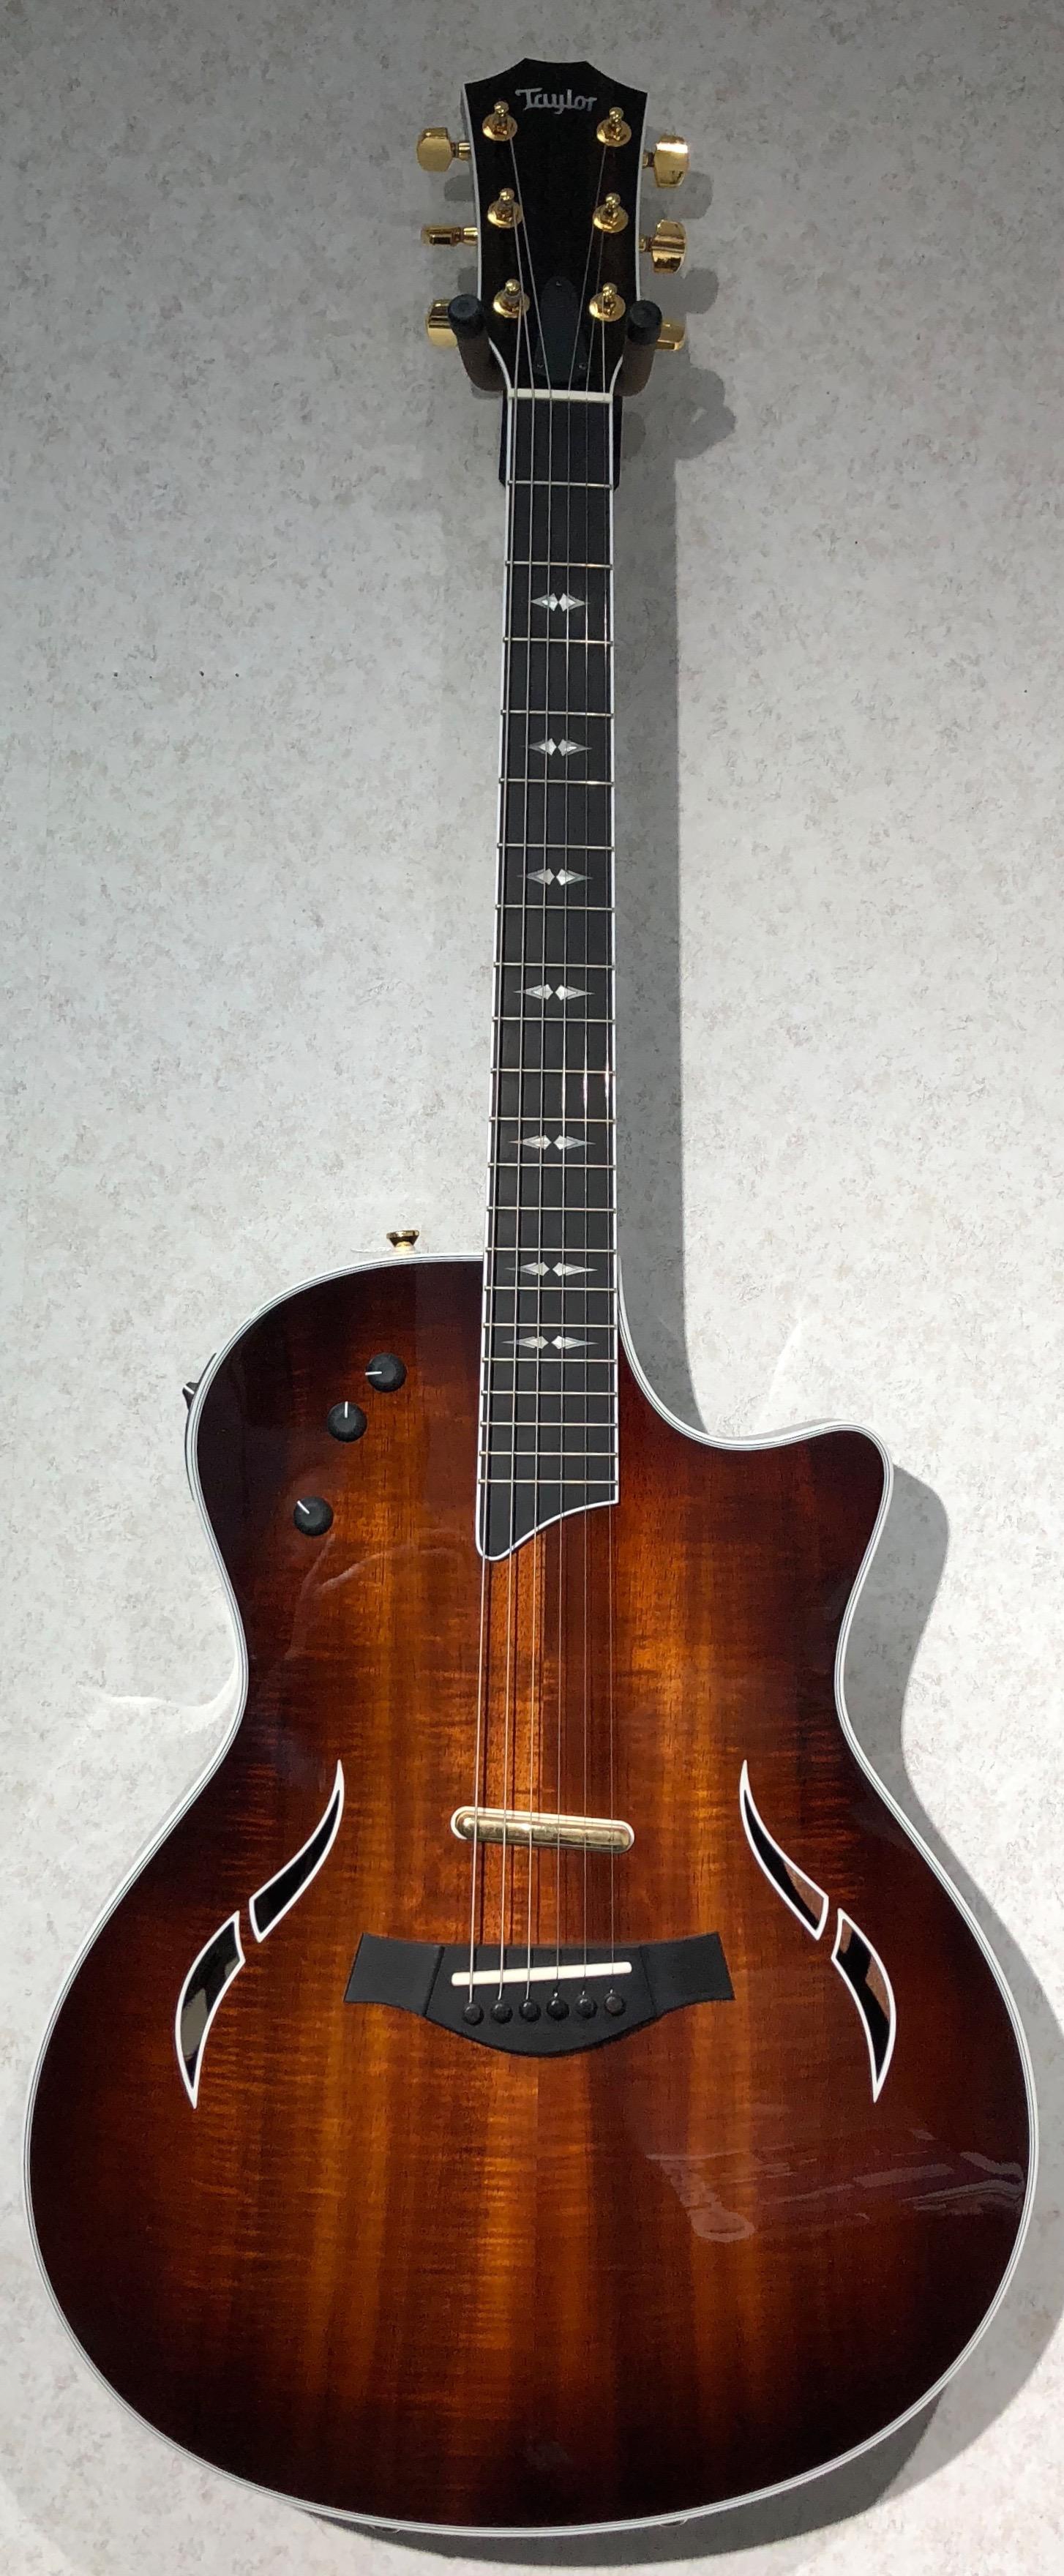 taylor guitars t5 custom koa legacy music. Black Bedroom Furniture Sets. Home Design Ideas